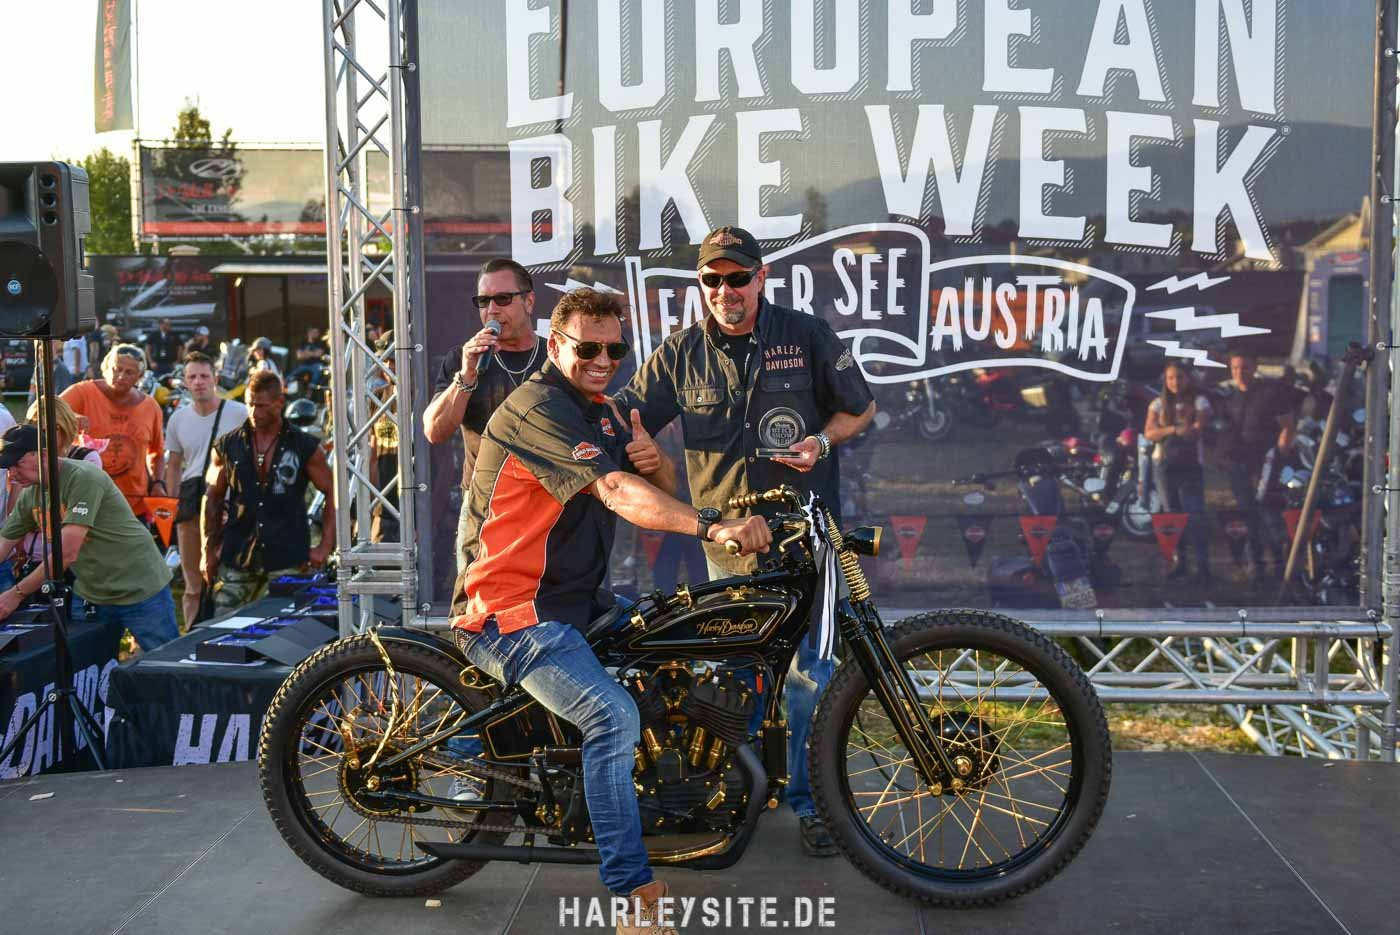 European-Bike-Week-0884